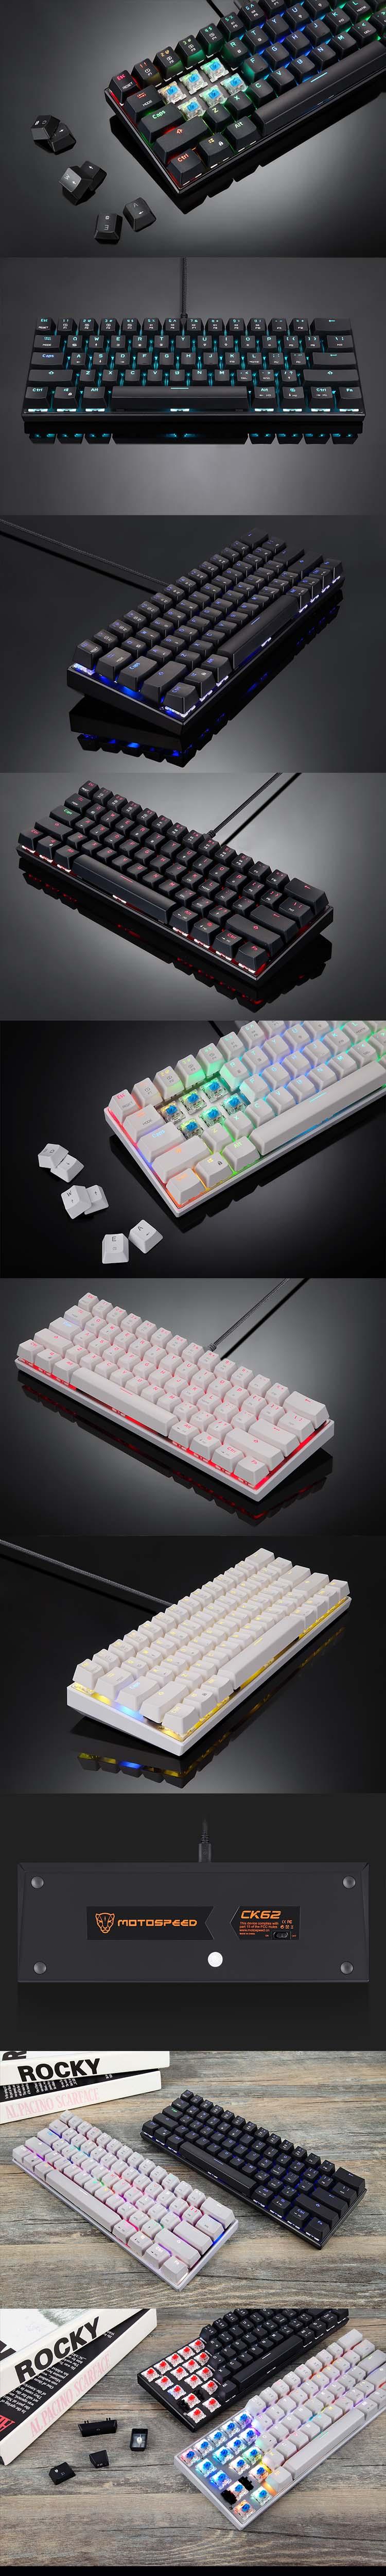 CK62 RGB Kablolu Bluetooth Mekanik Klavye